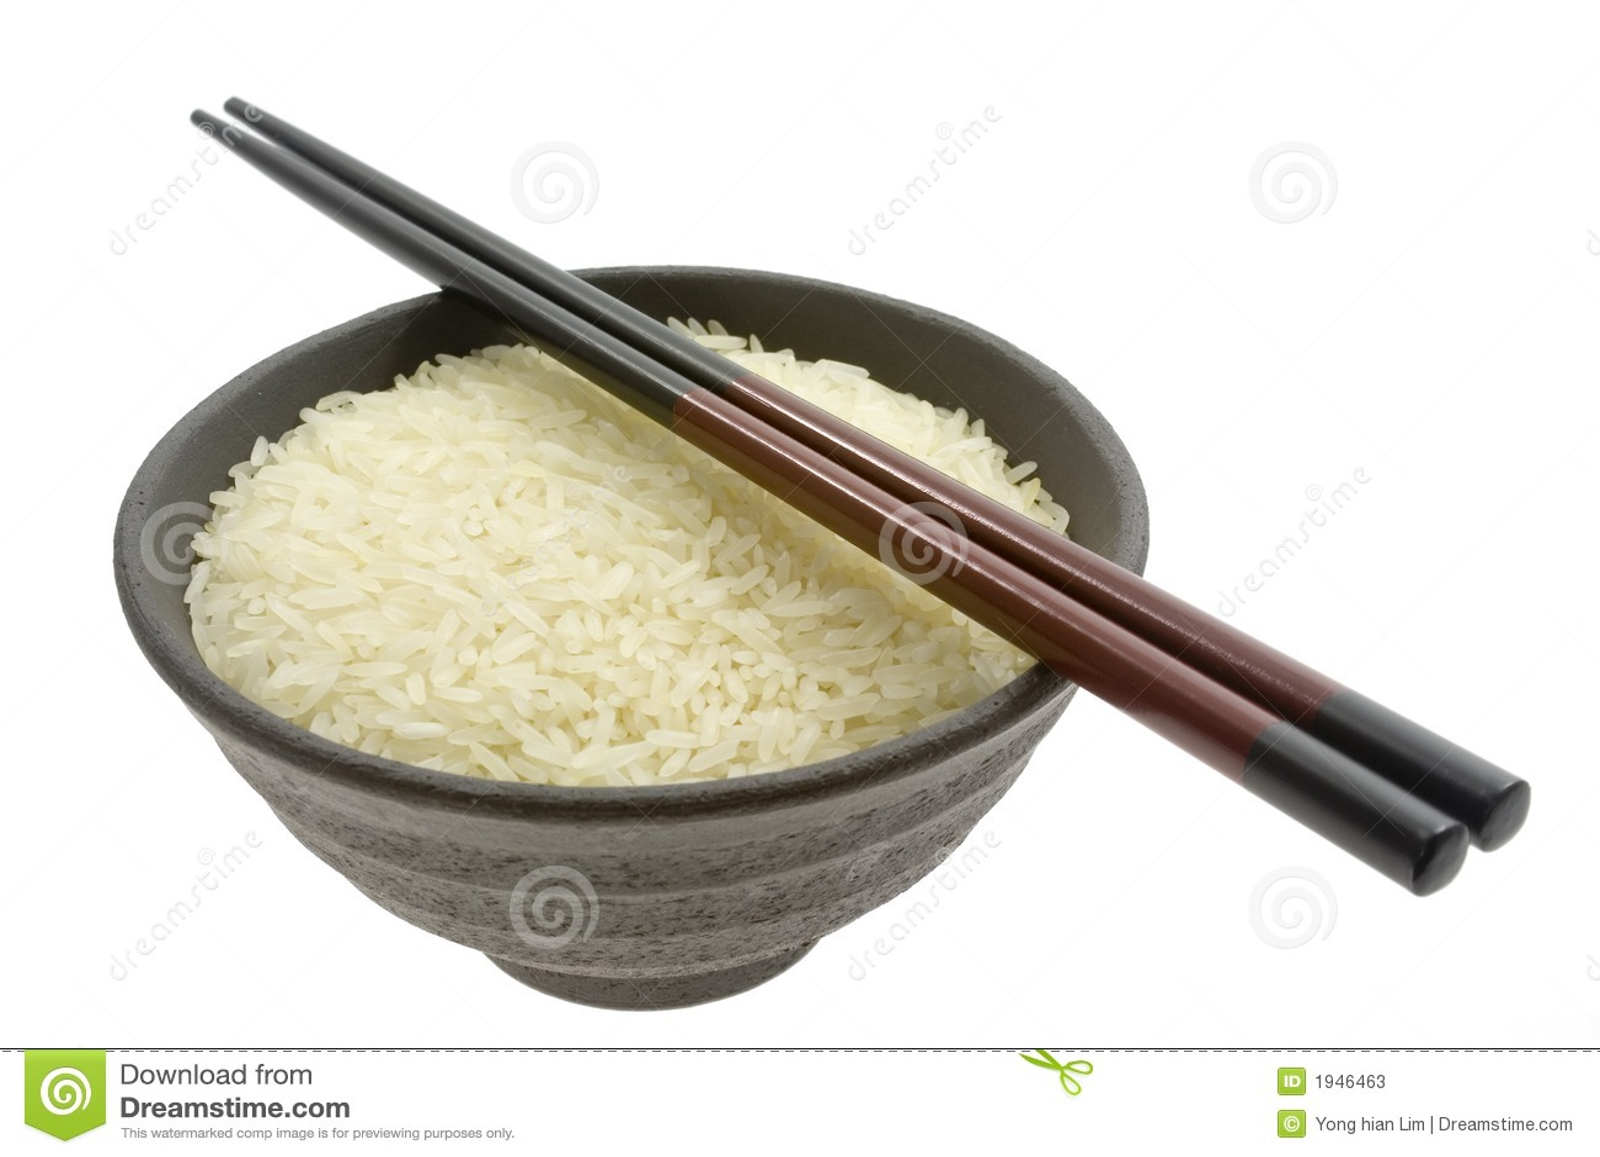 Bowl Of Rice With Chopsticks Stock Photos - Image: 1946463